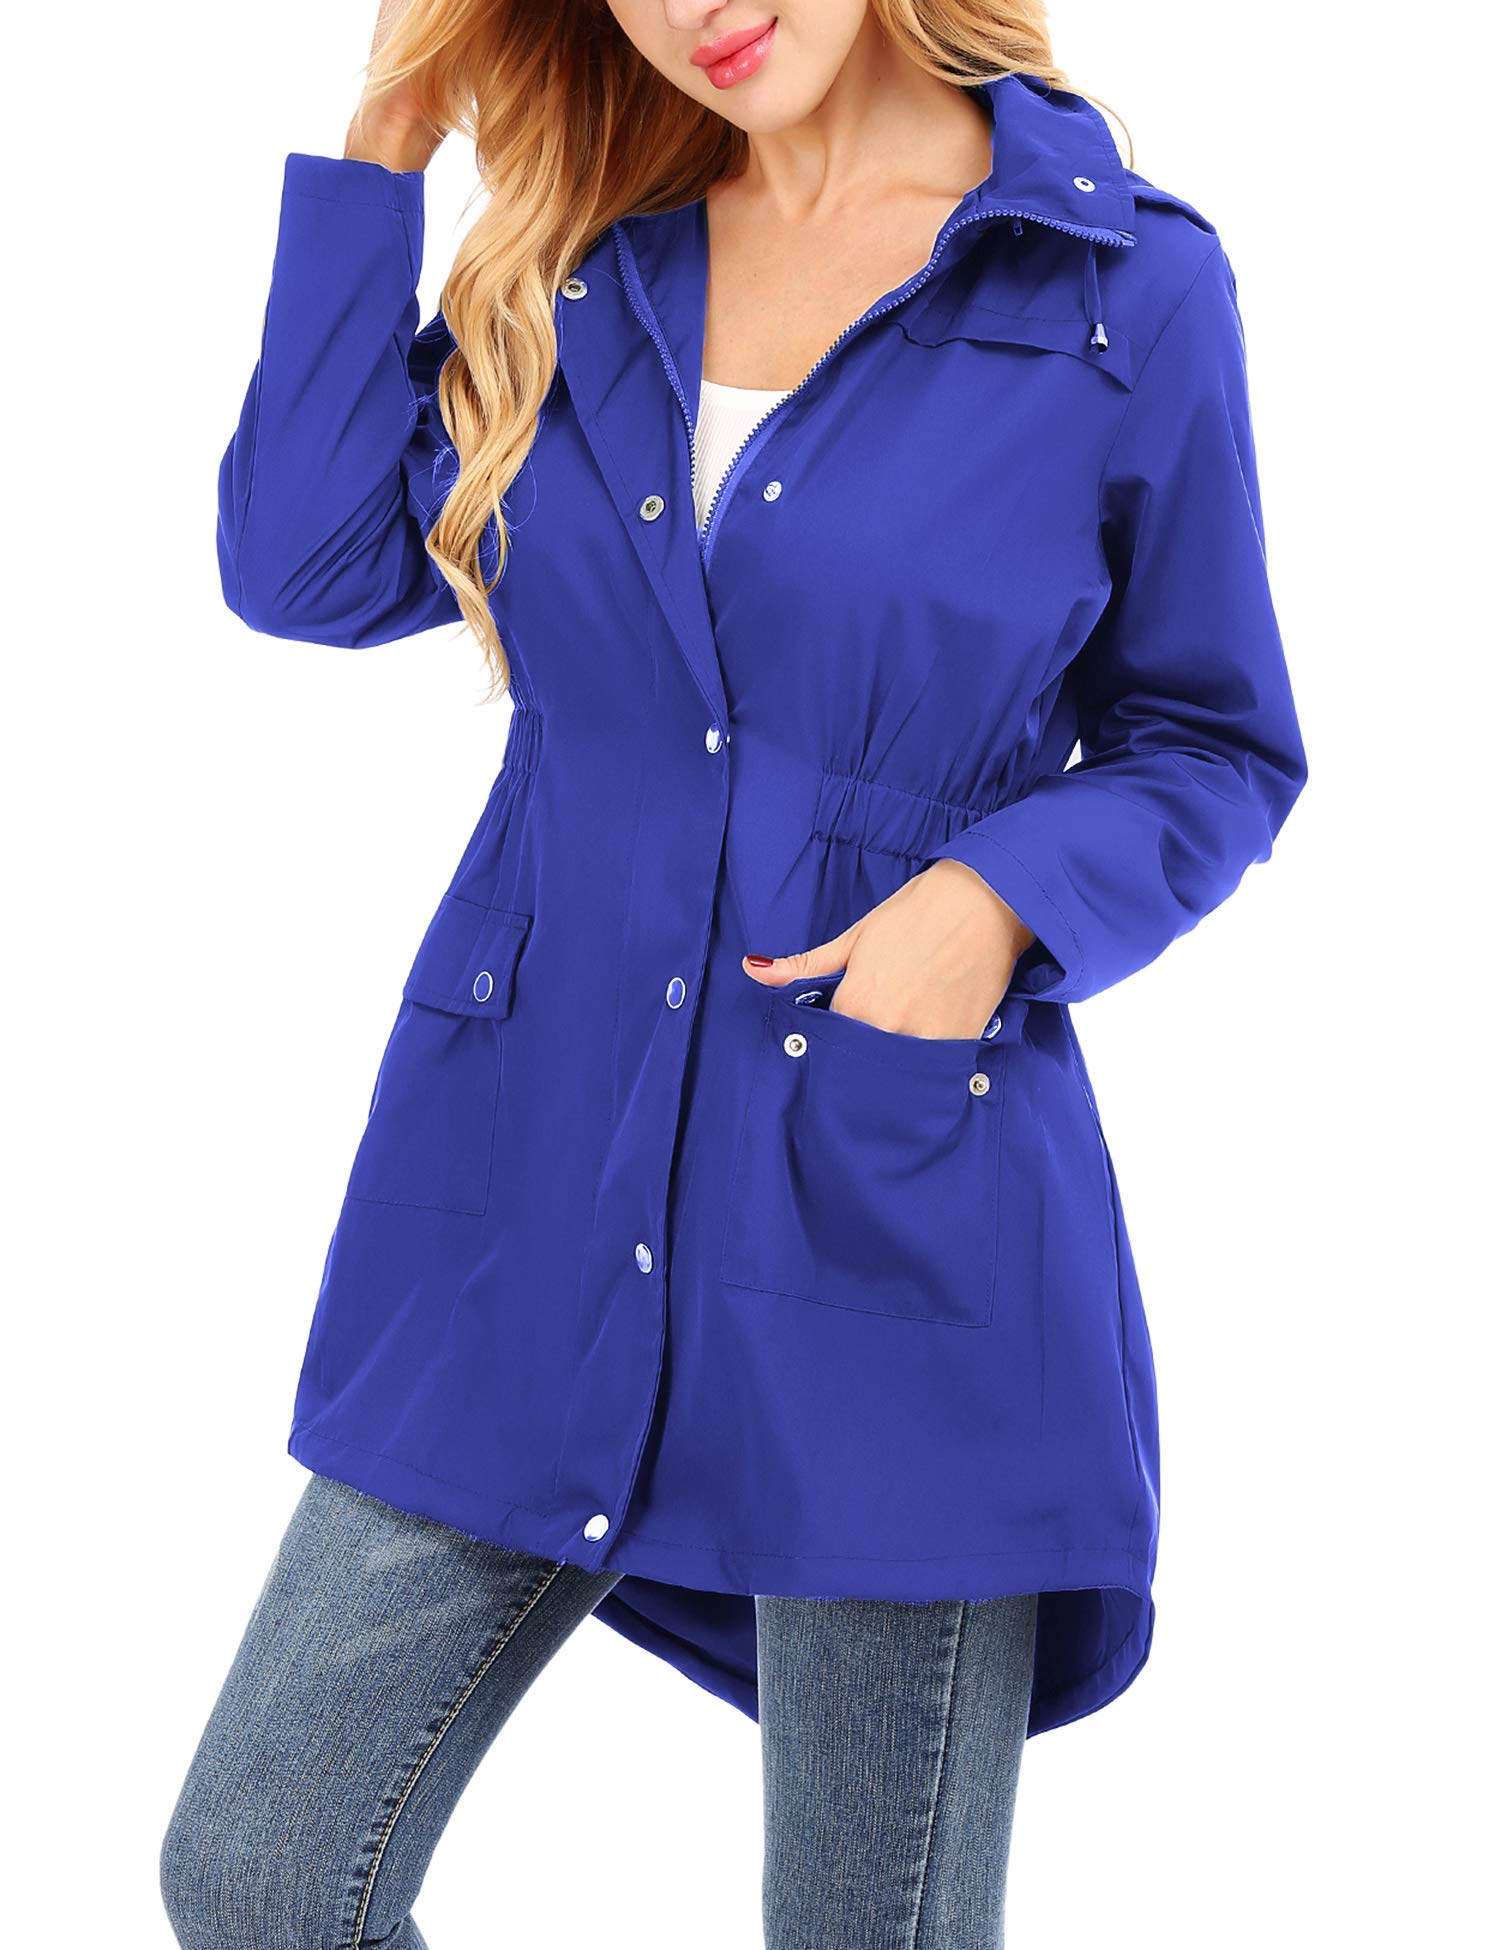 Uniboutique Raincoat Waterproof Outdoor Hooded Lightweight Rain Jacket Windbreaker by Uniboutique (Image #4)